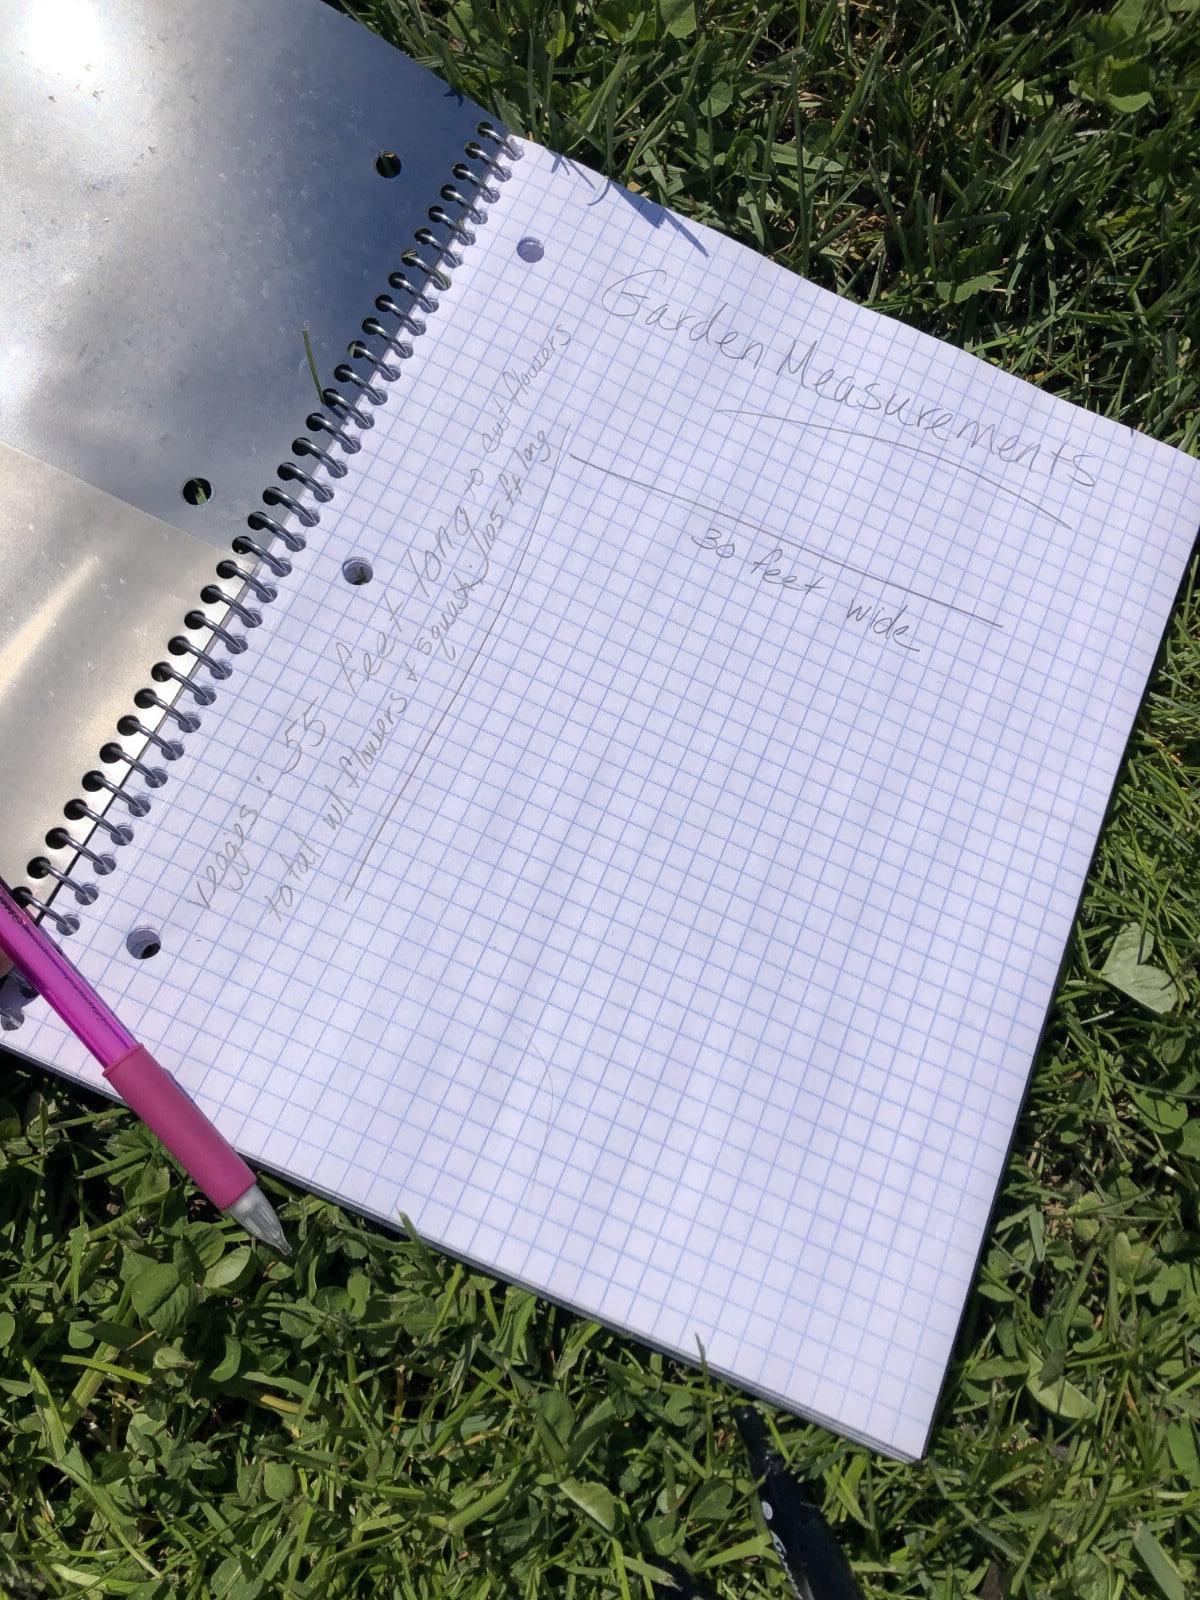 garden journal on grass with pencil